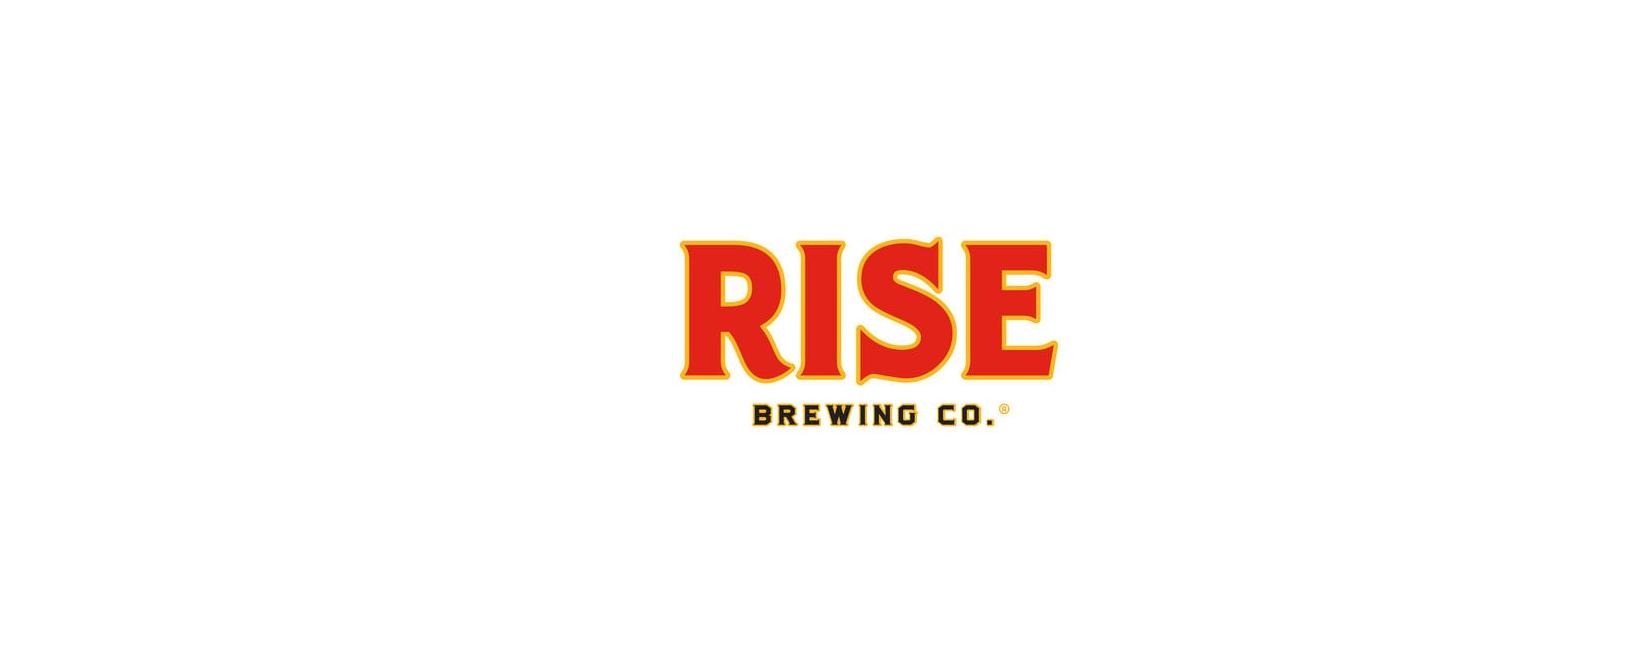 Rise Brewing Discount Code 2021